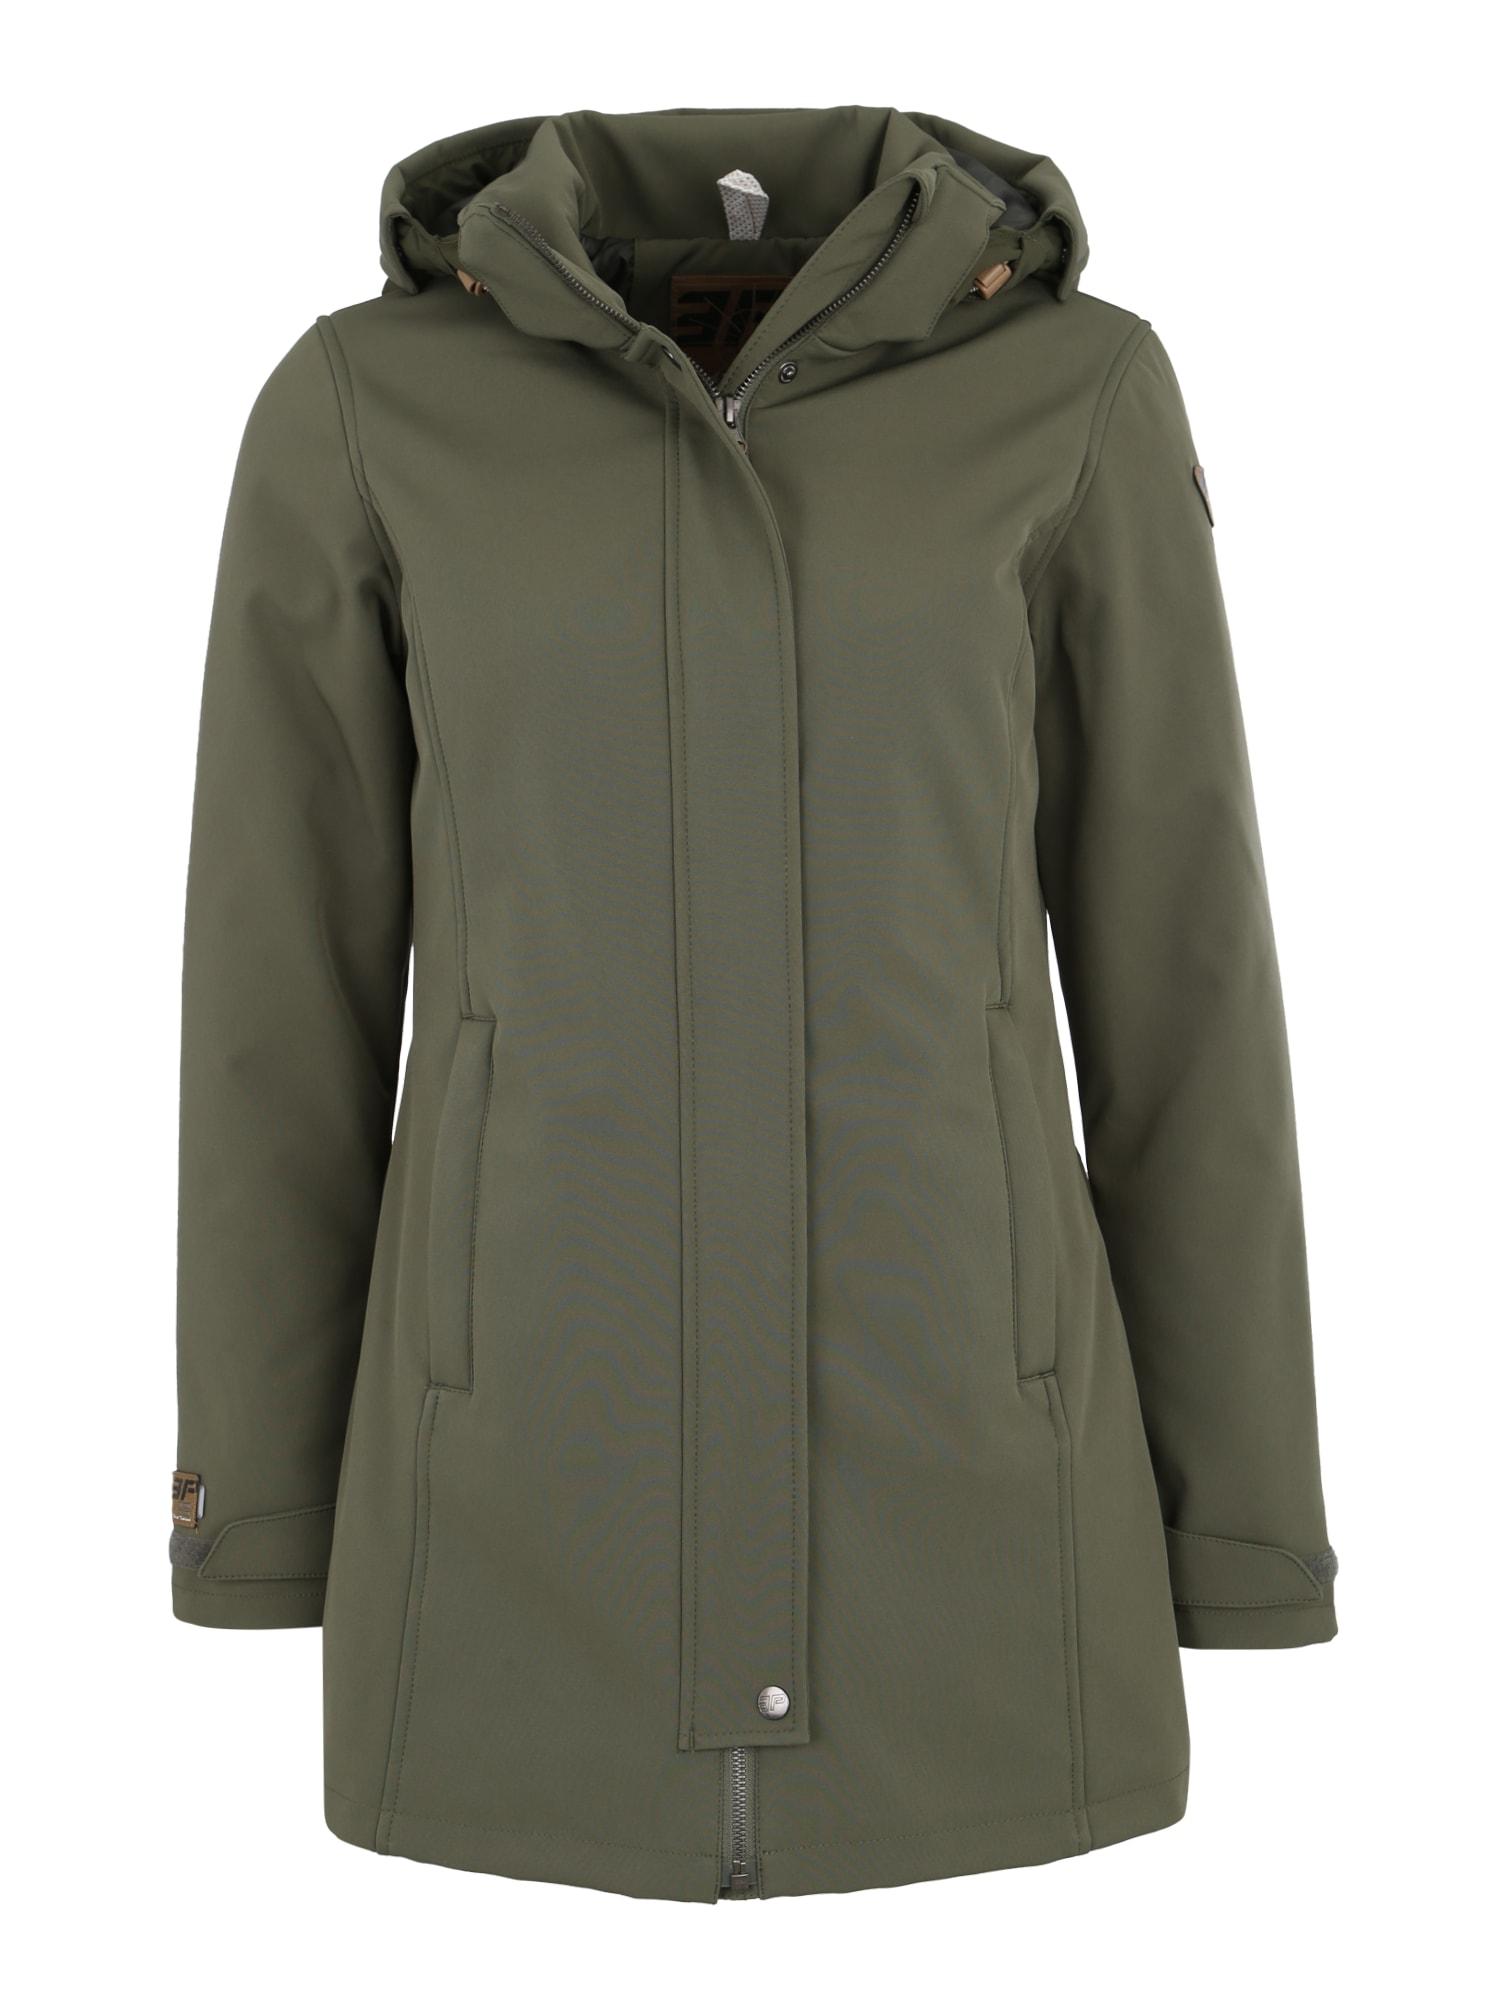 Outdoorový kabát TEZA khaki ICEPEAK